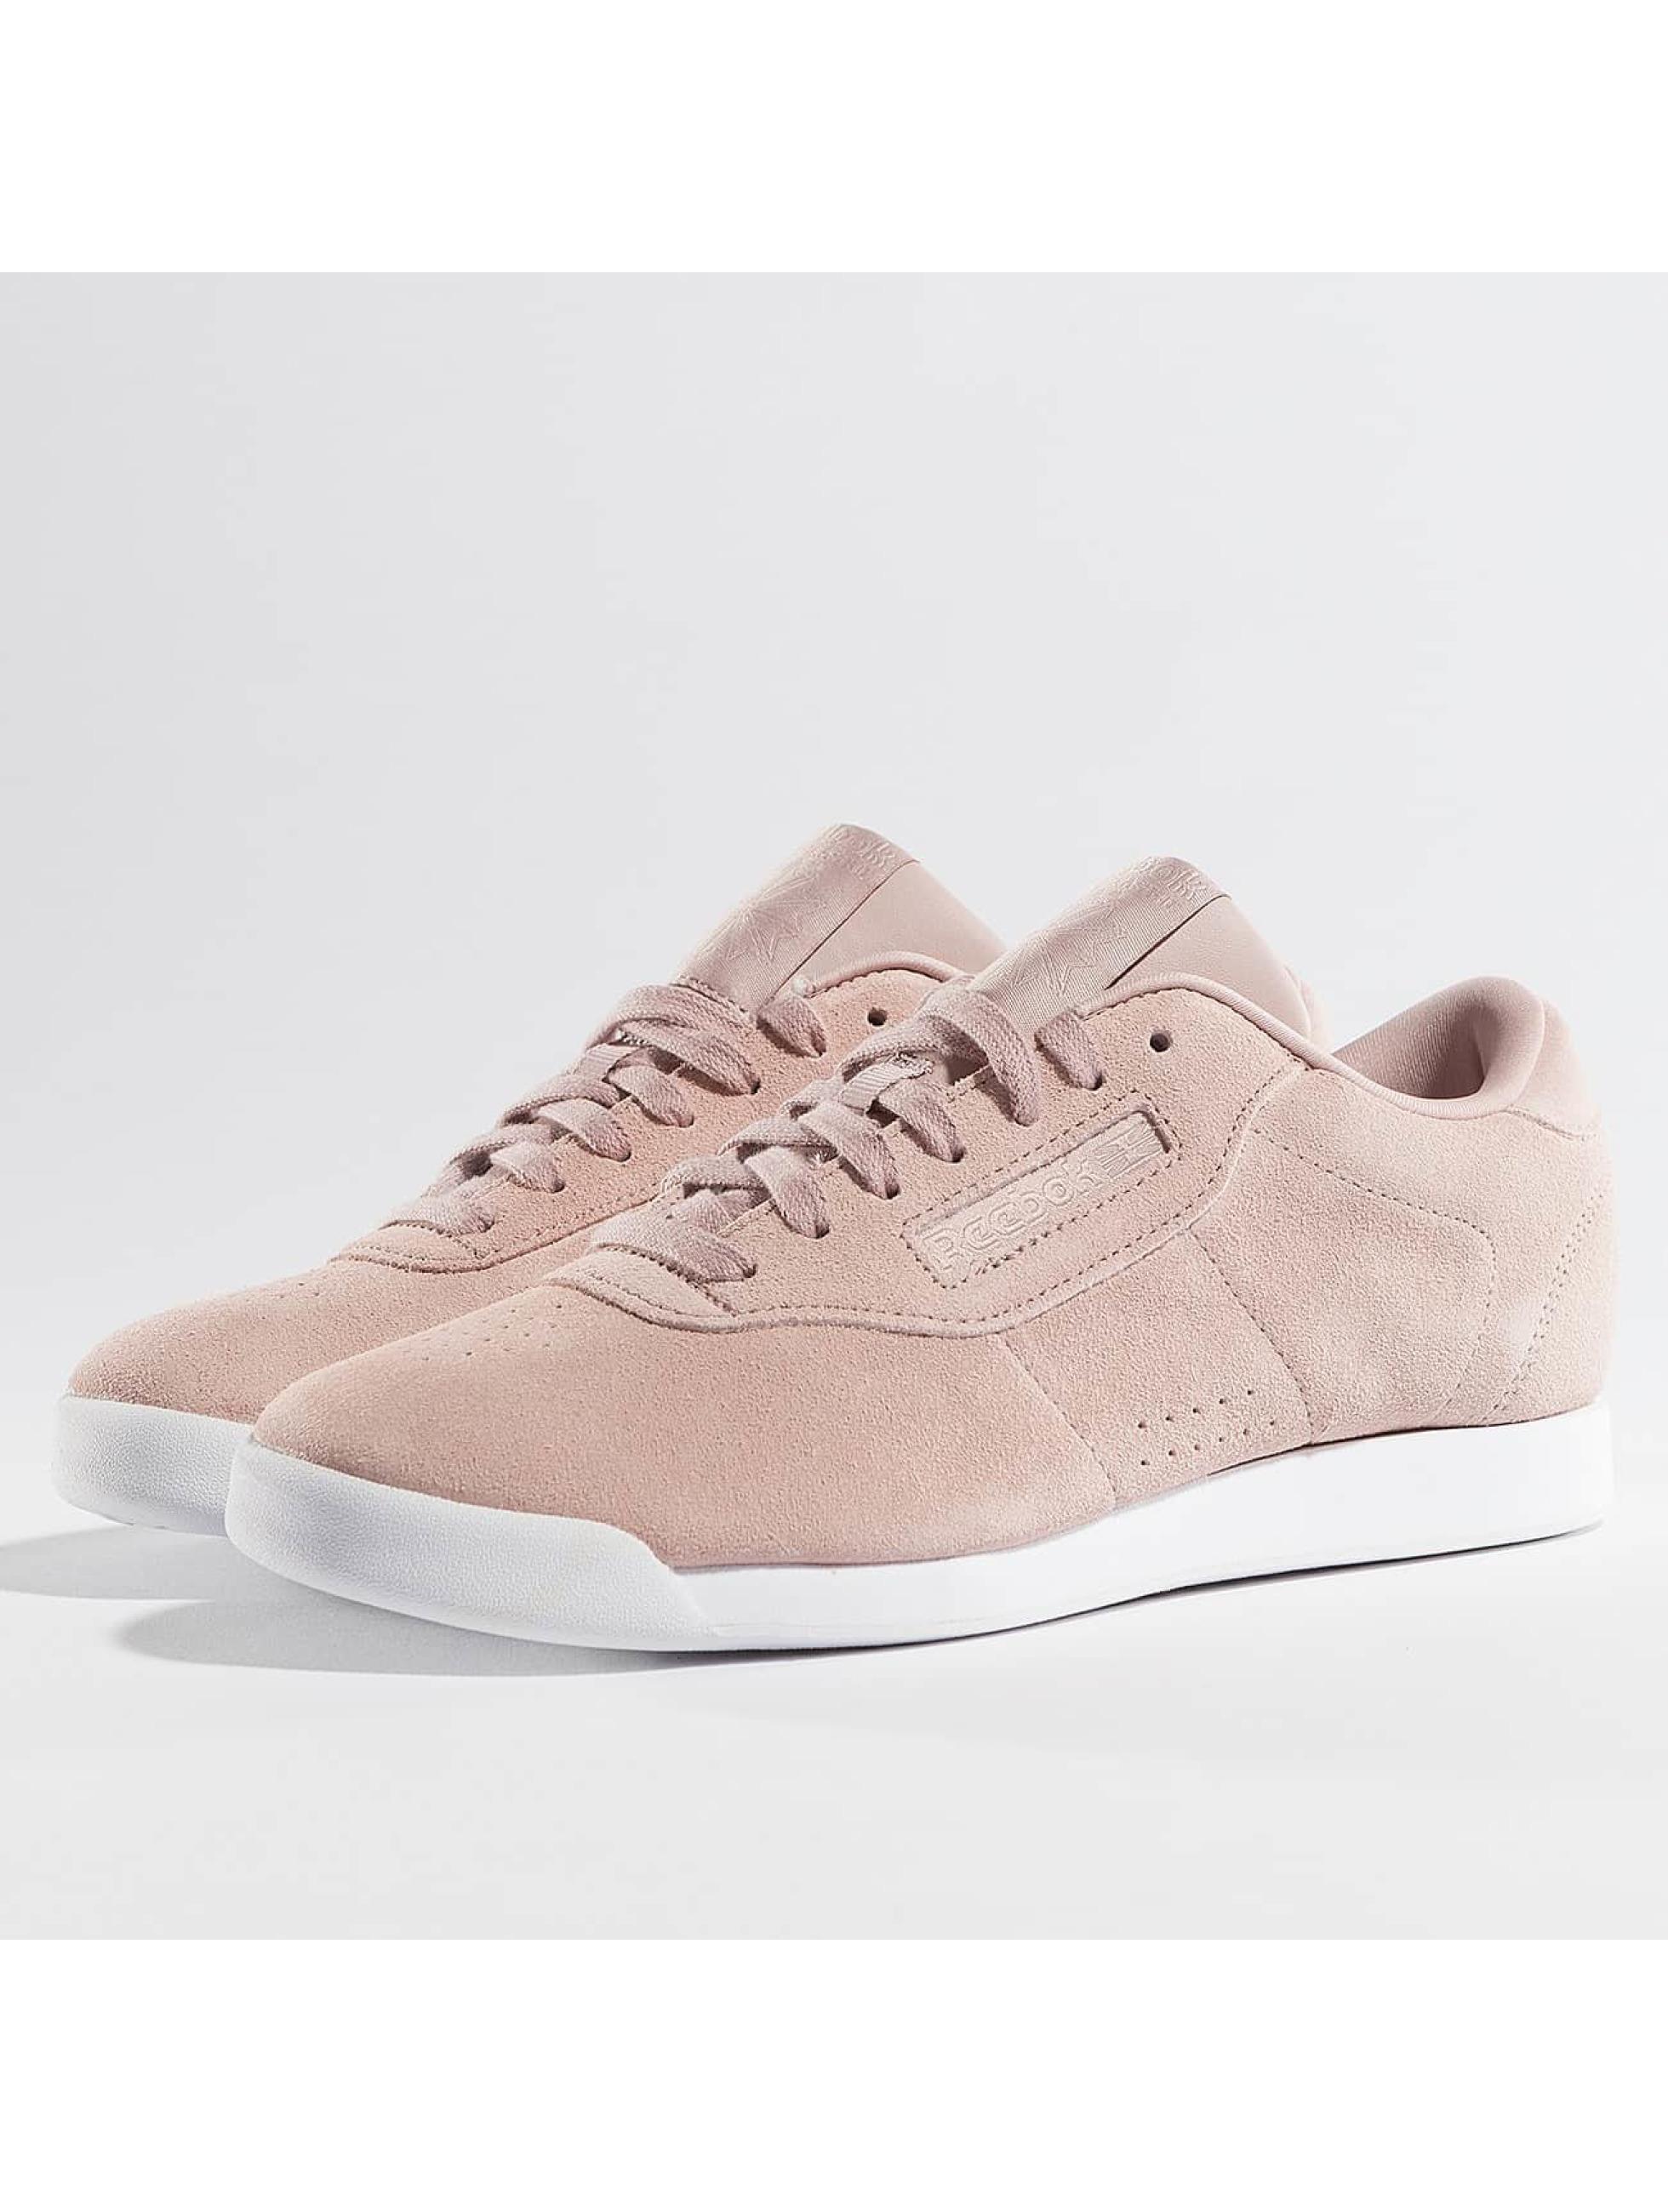 Reebok Frauen Sneaker Princess EB in rosa